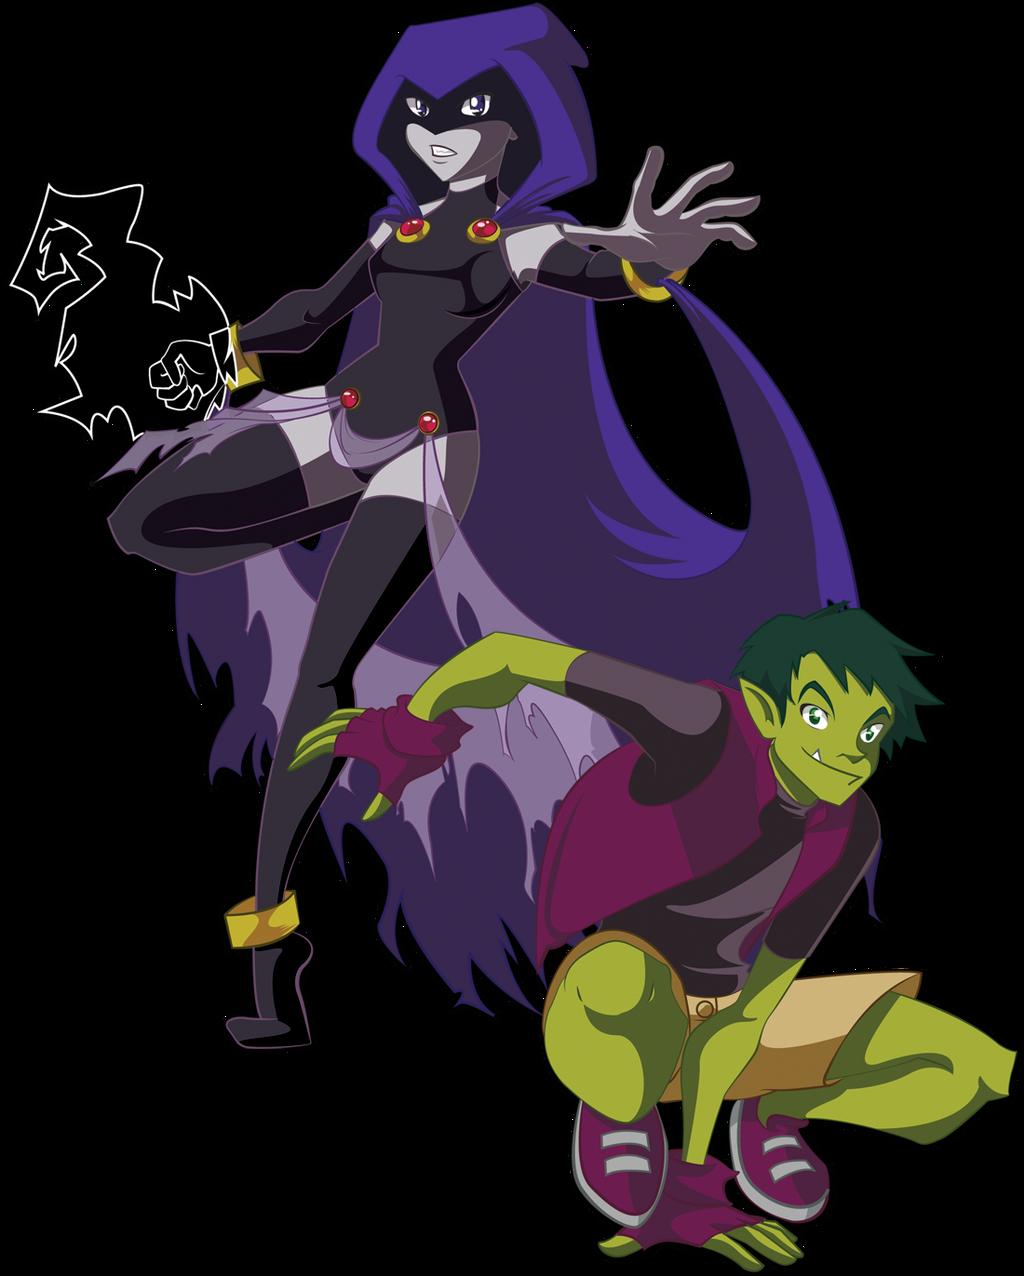 Raven And Beast Boy Lemon Raven And Beast Boy by